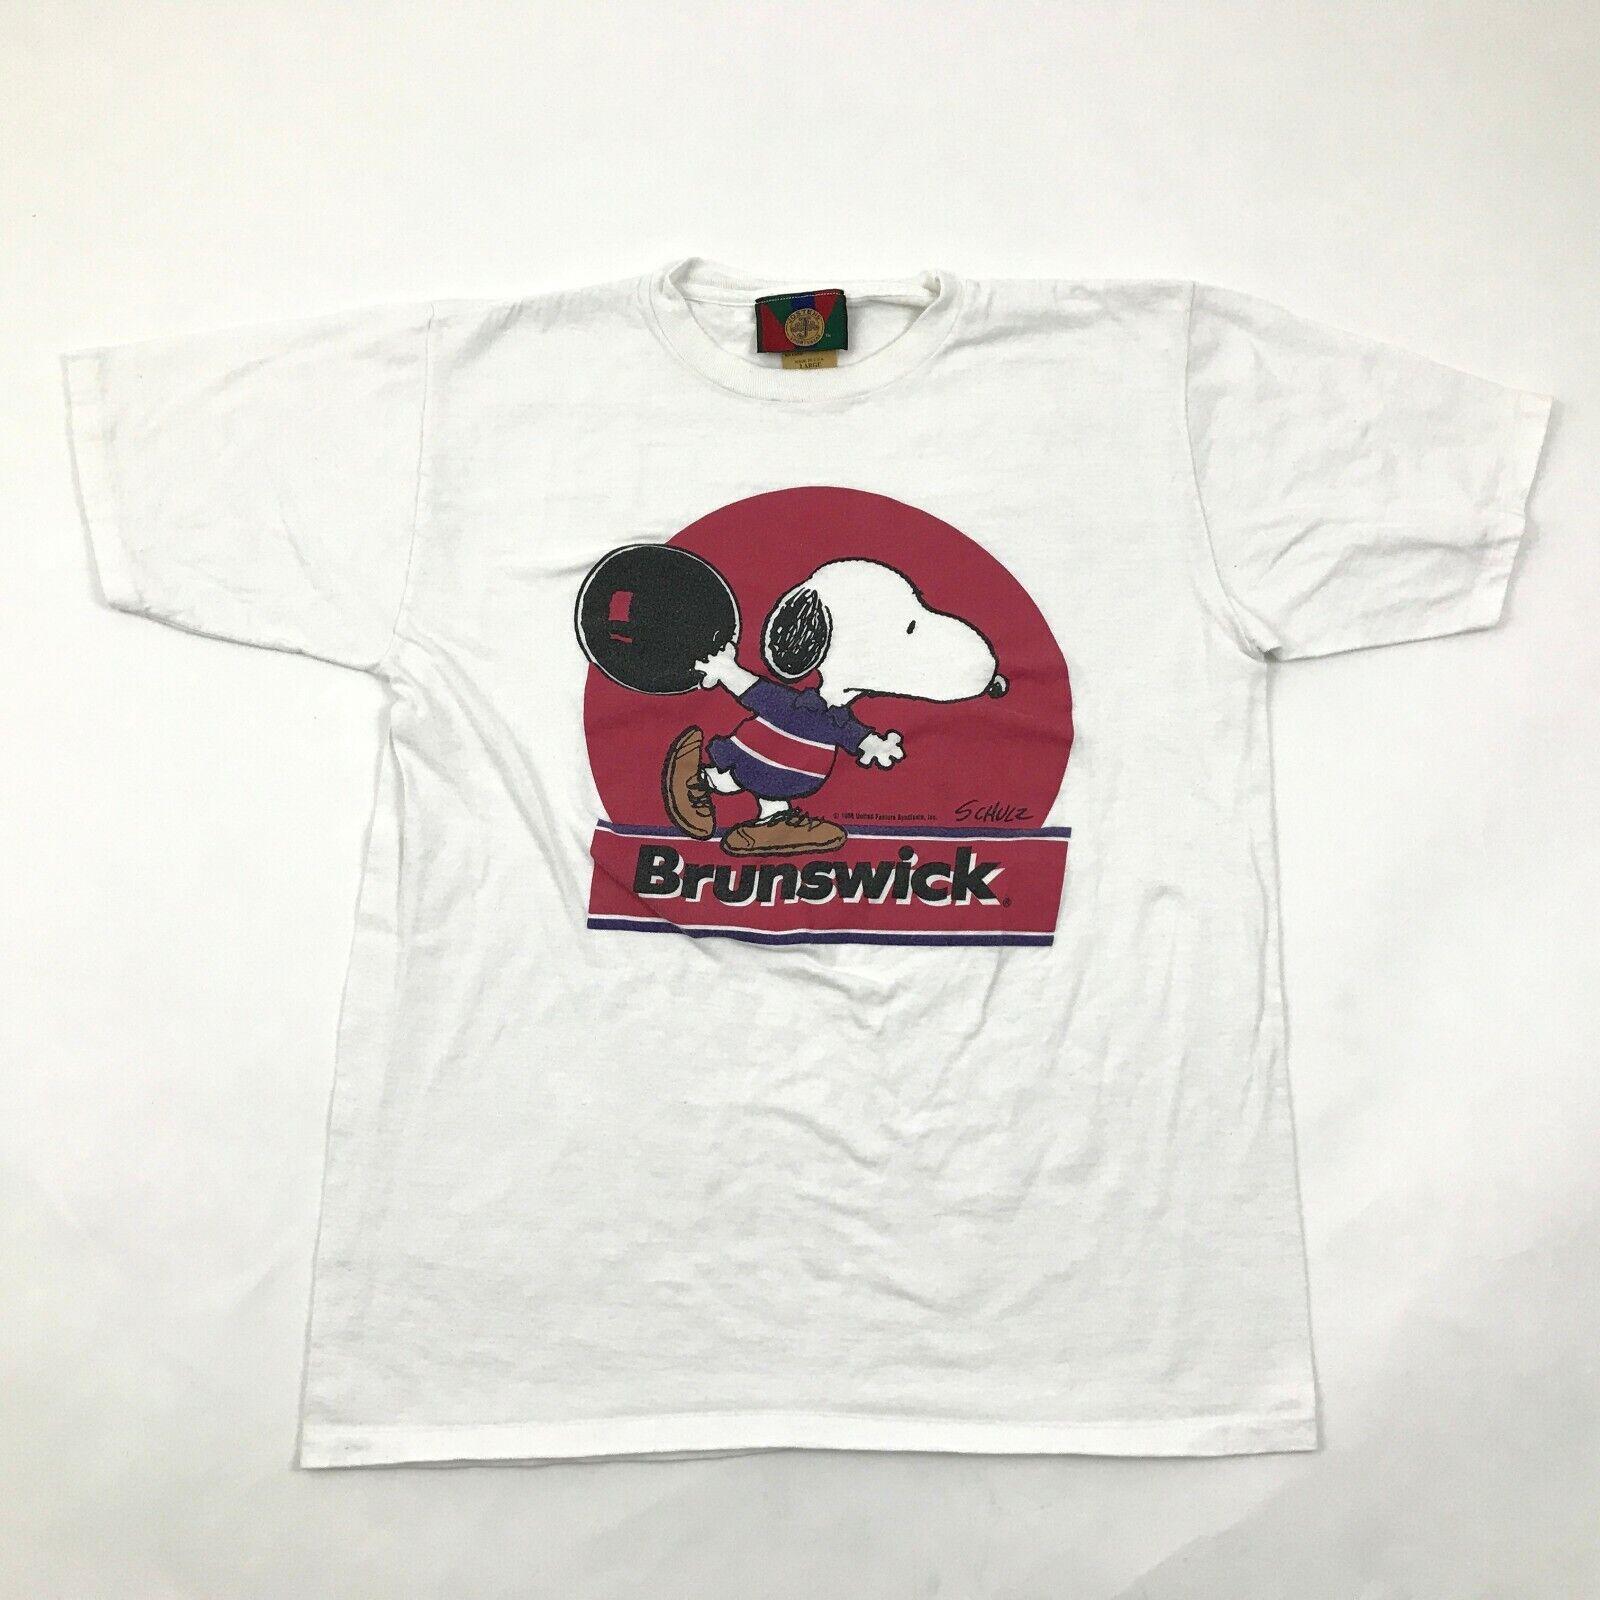 52080a219 VINTAGE Snoopy Shirt Size L Large White Tee Single Stitch Shultz 1958 USA  MADE